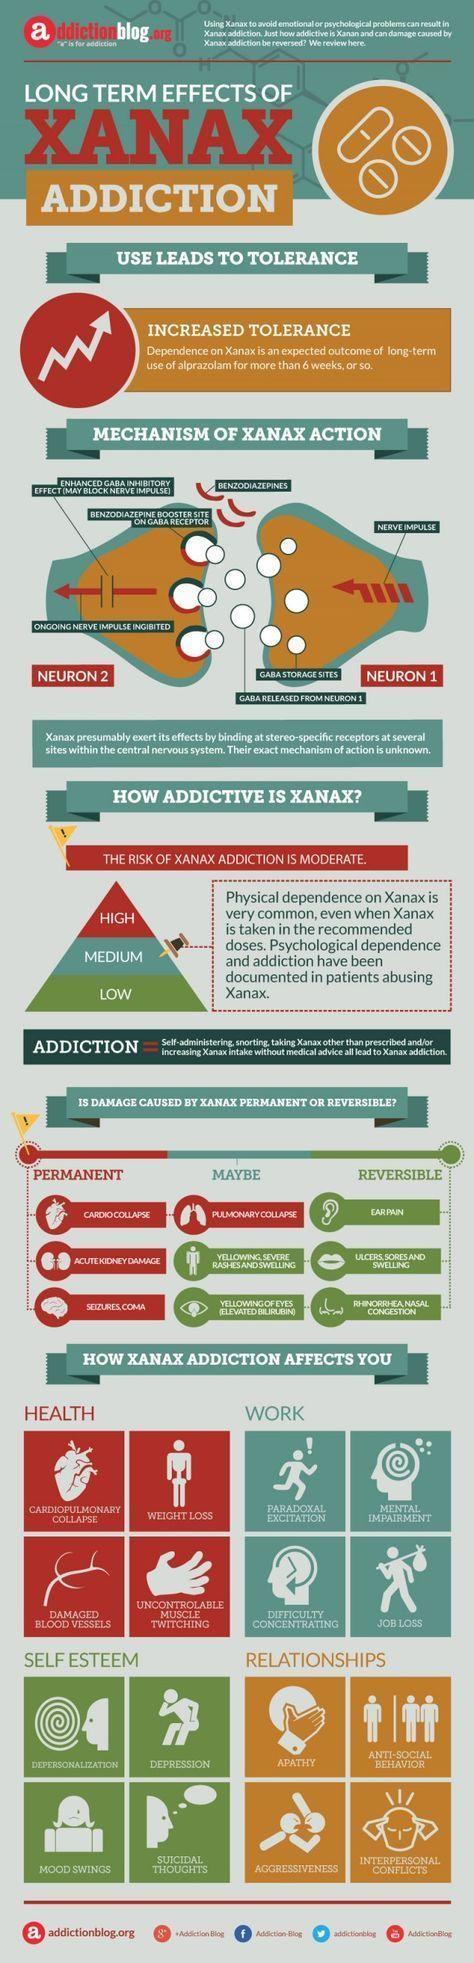 Psychology : Long term effects of Xanax addiction (INFOGRAPHIC) Follow: www.pinterest.com